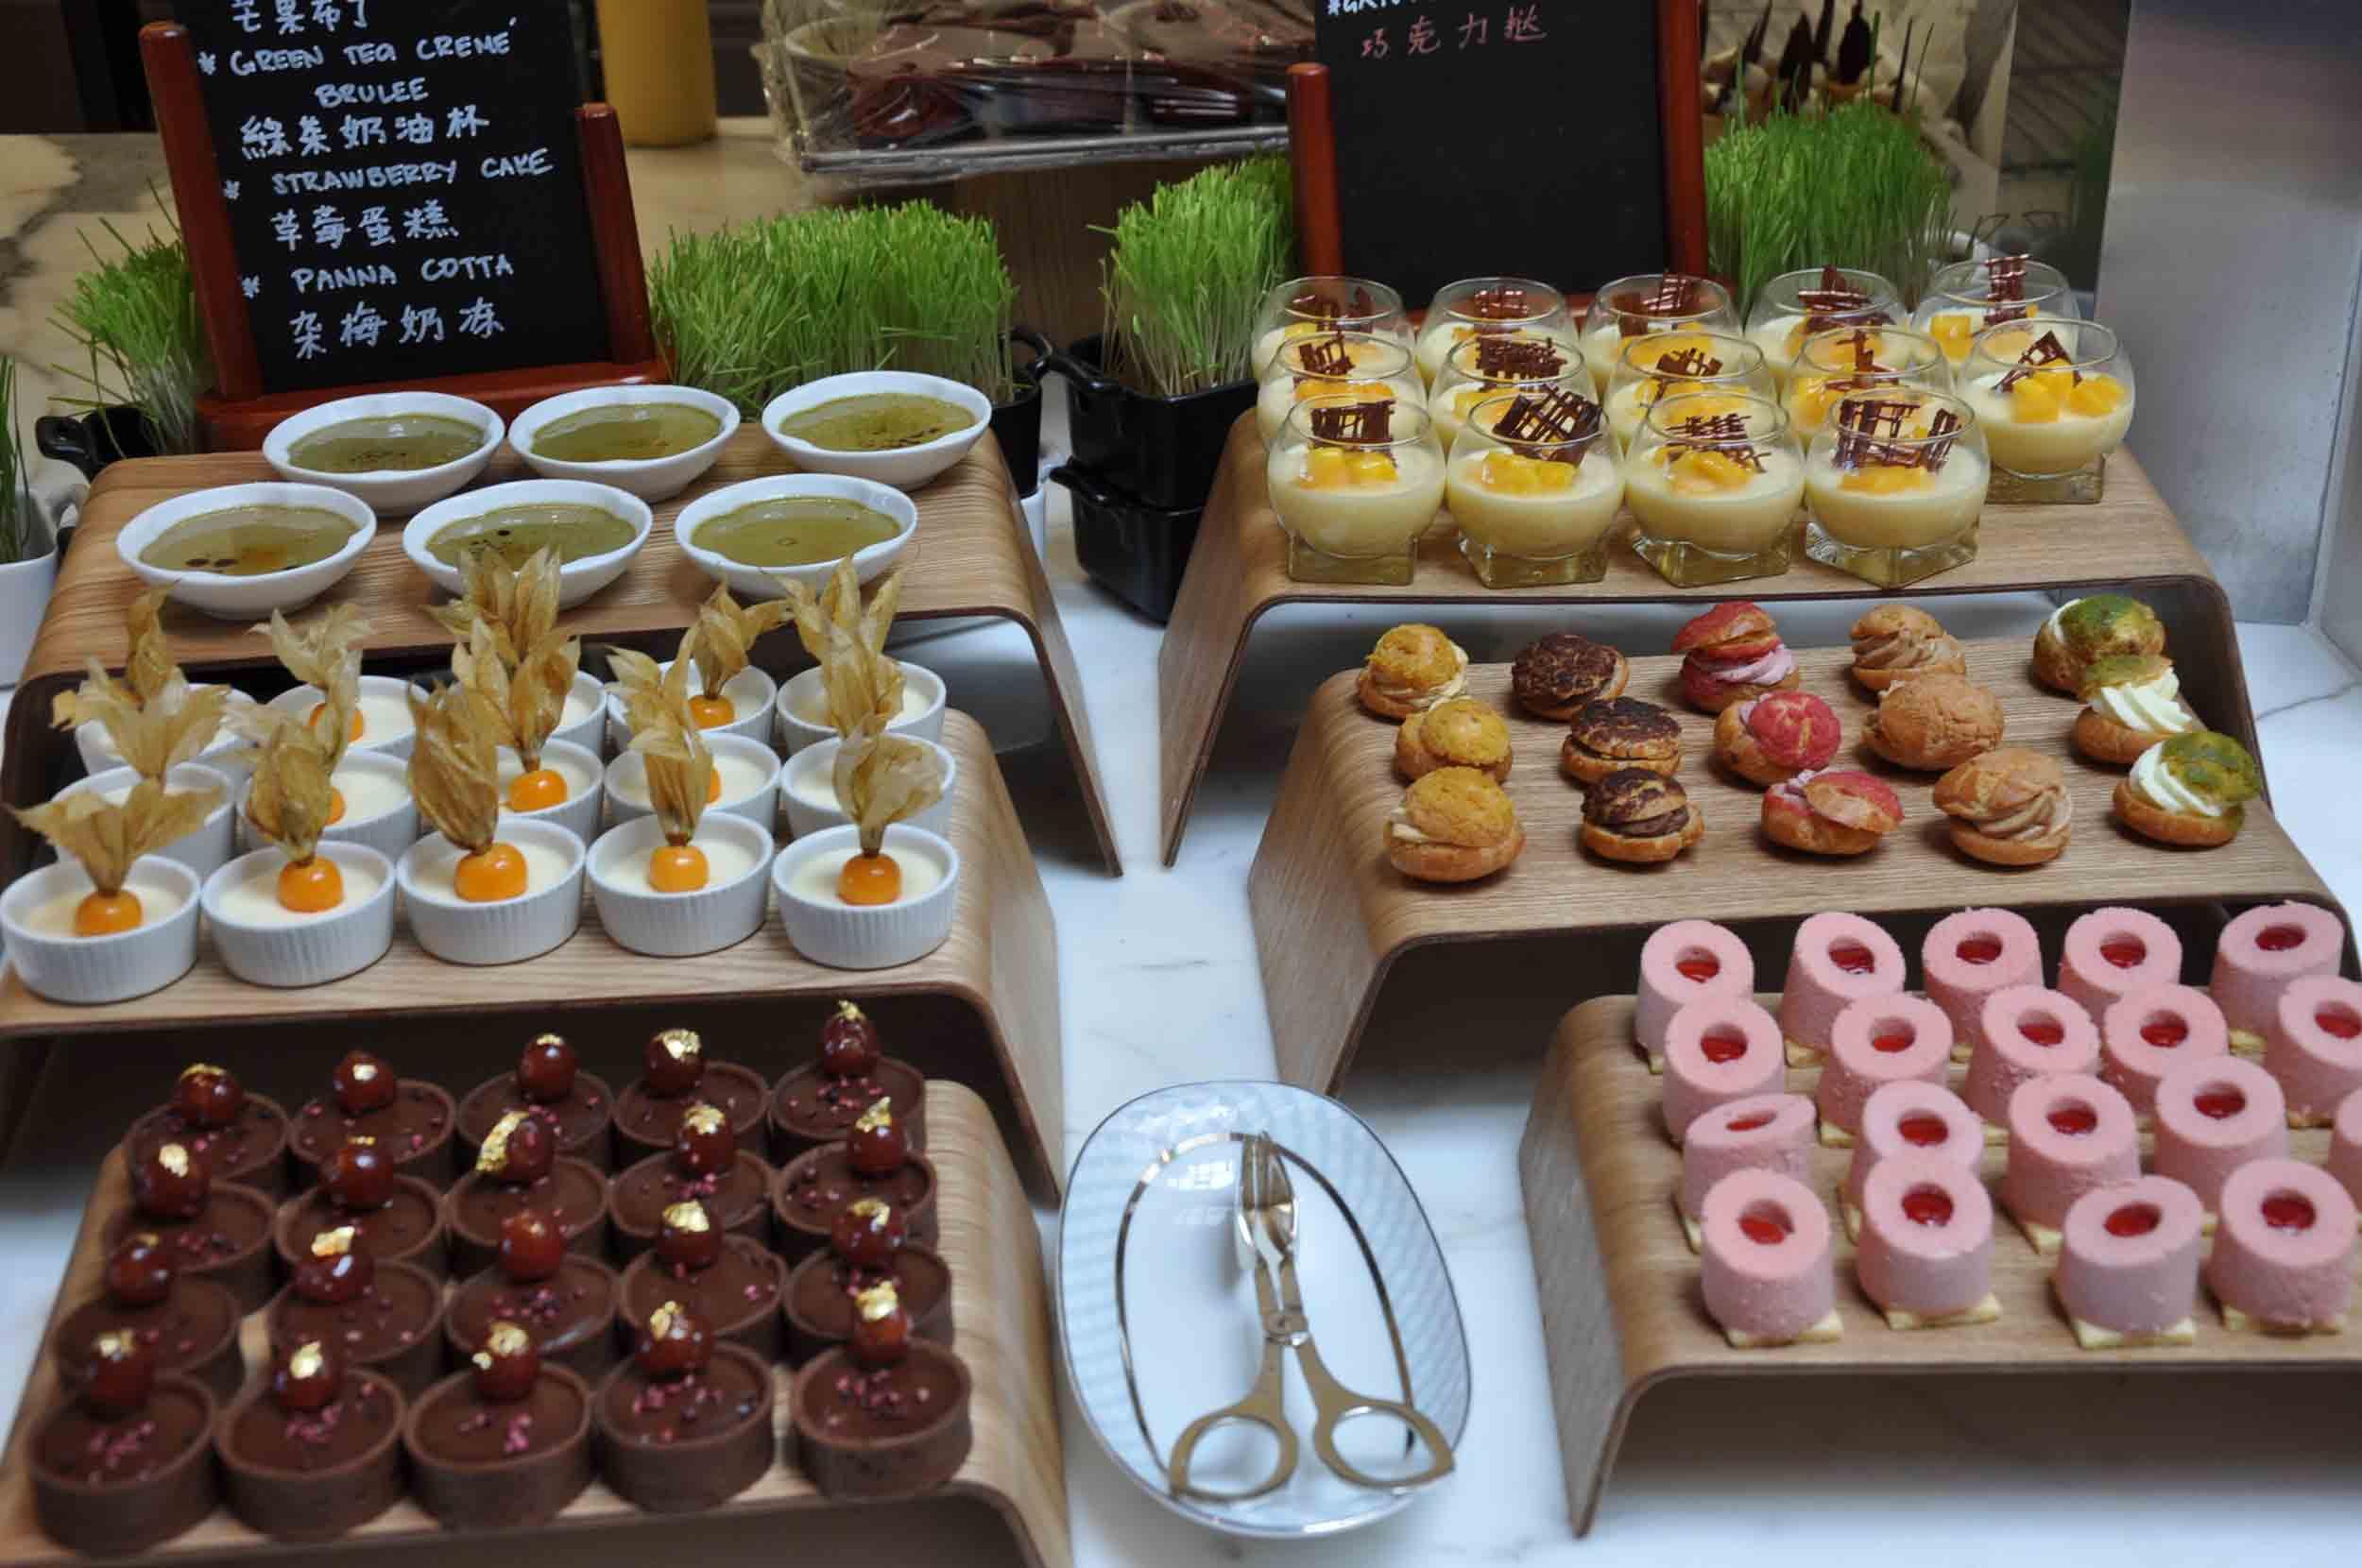 Ritz-Carlton Macau Club Lounge buffet dessert section